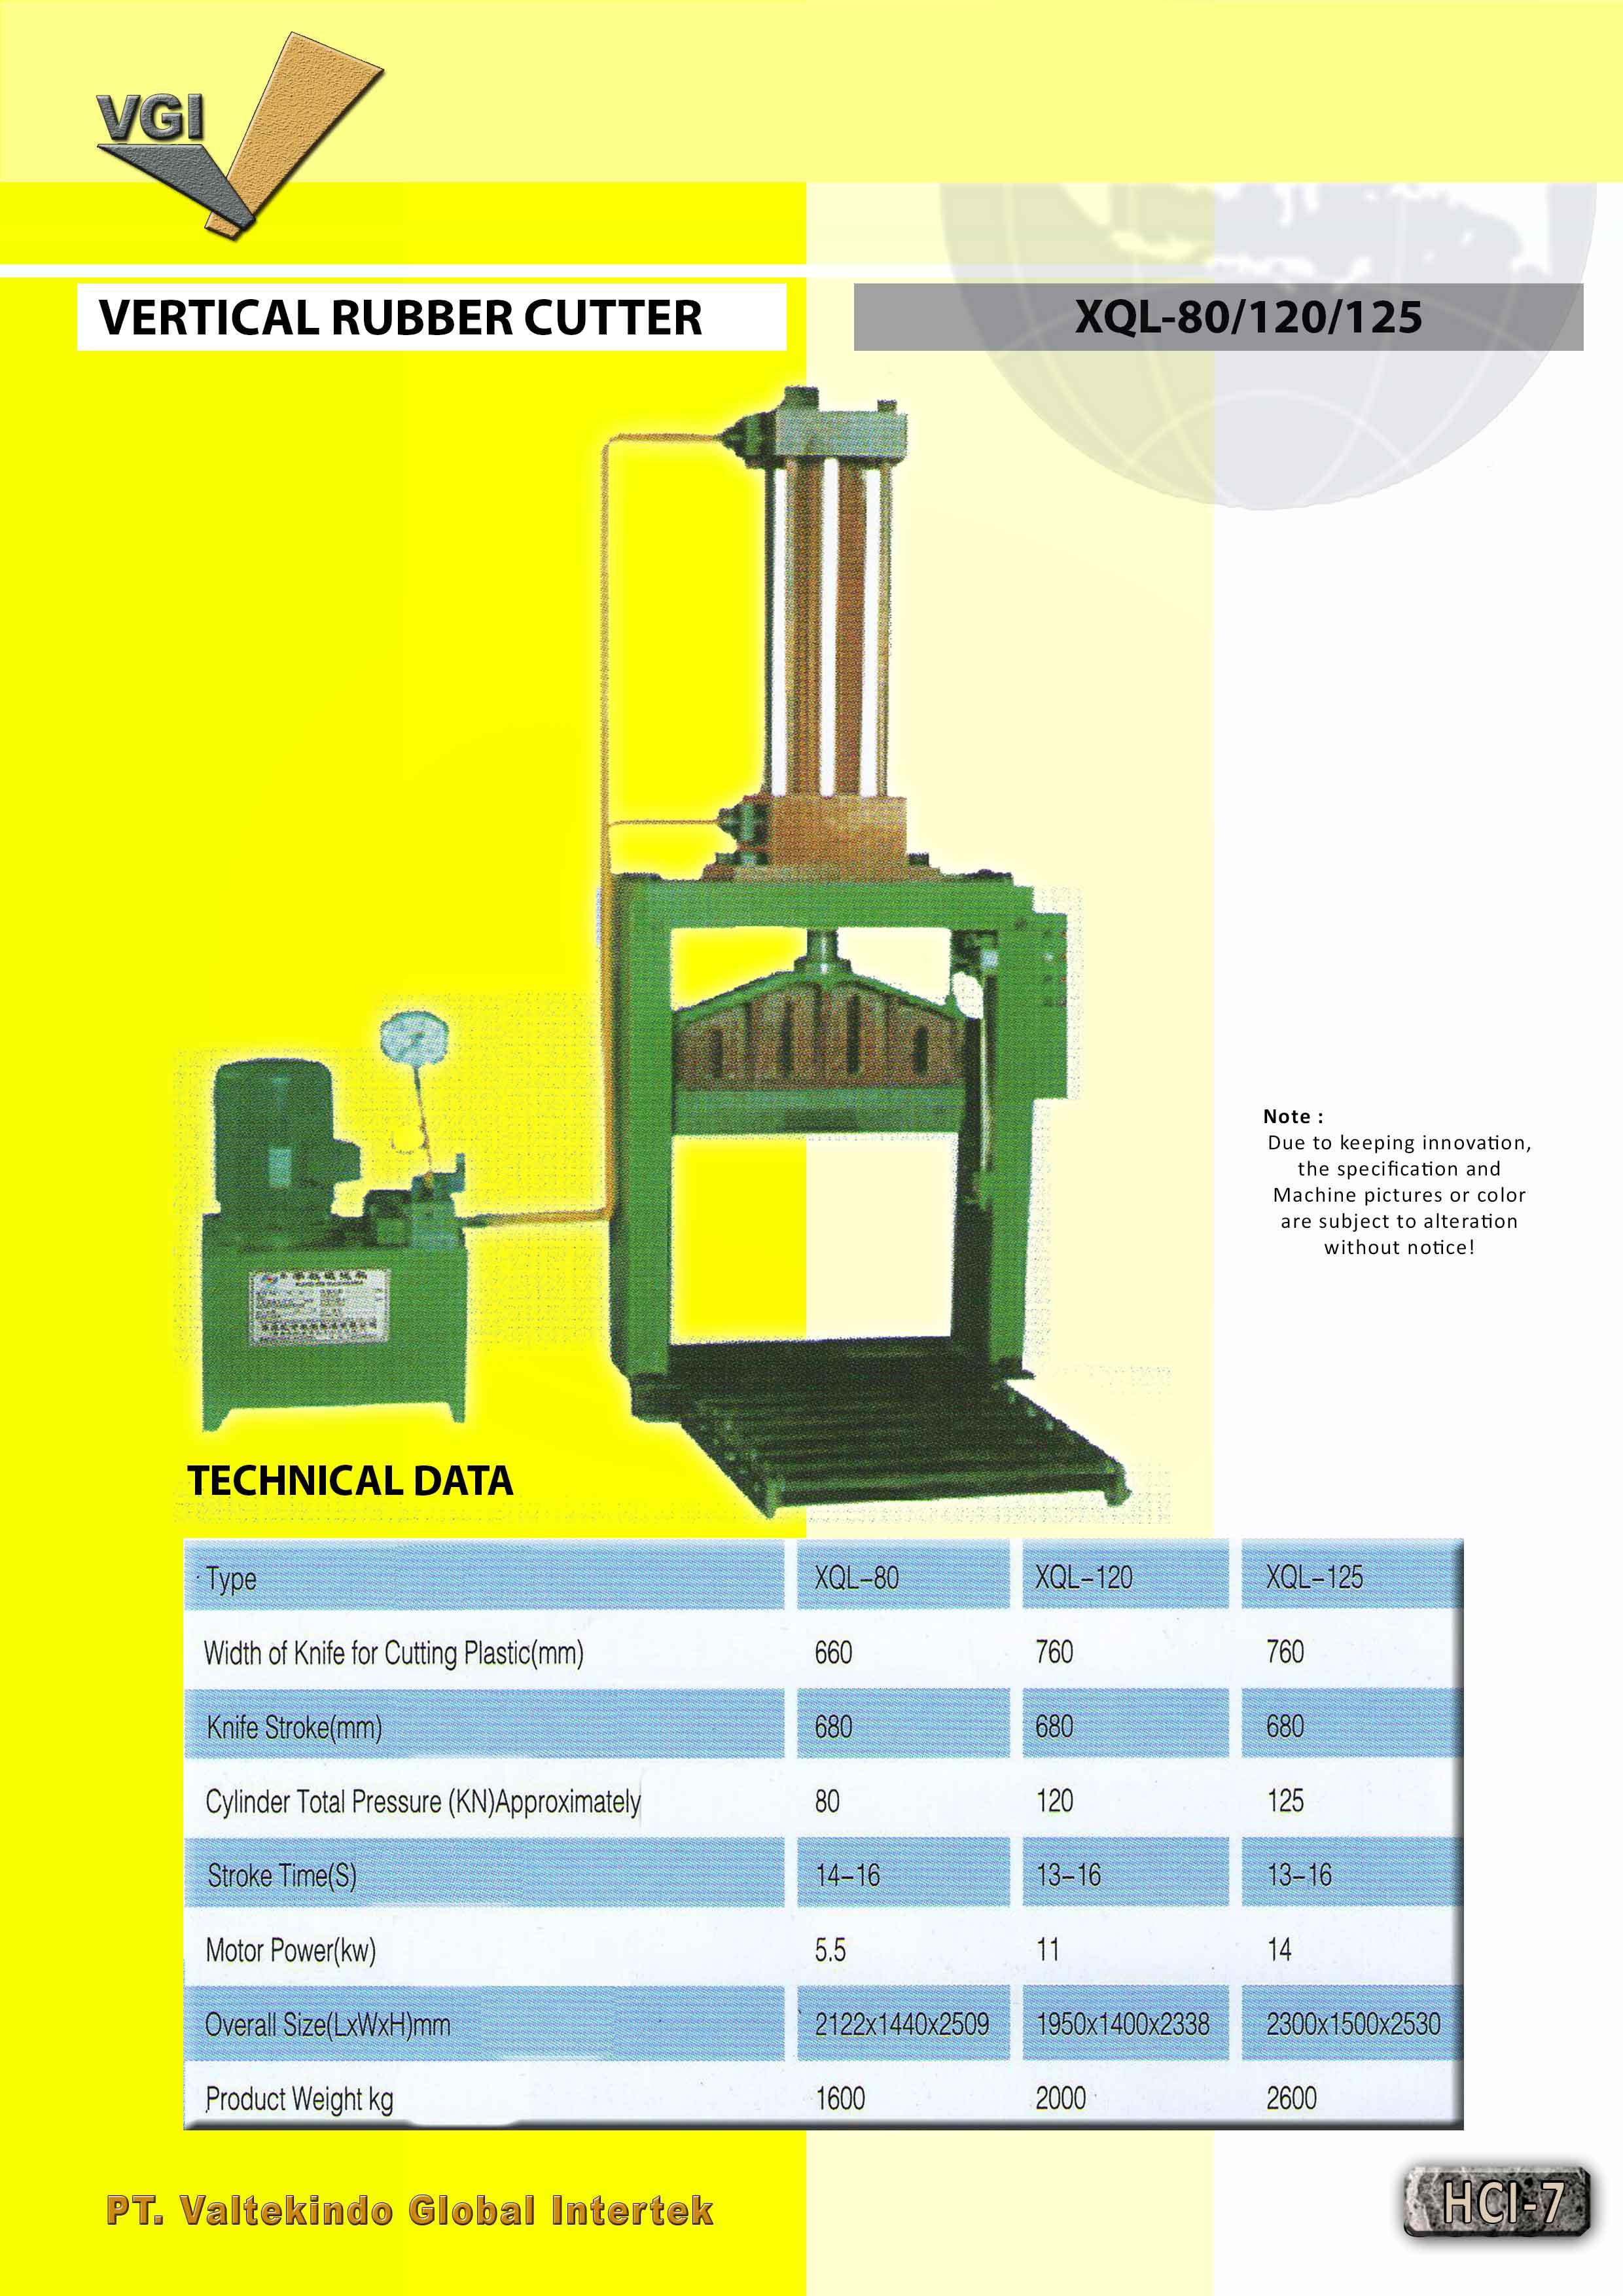 jual mesin, harga mesin, jual mesin bandung, distributor mesin, jual mesin karet, daur ulang karet, daur ulang plastik, mesin pertanian VERTICAL RUBBER CUTTER VERTICAL RUBBER CUTTER